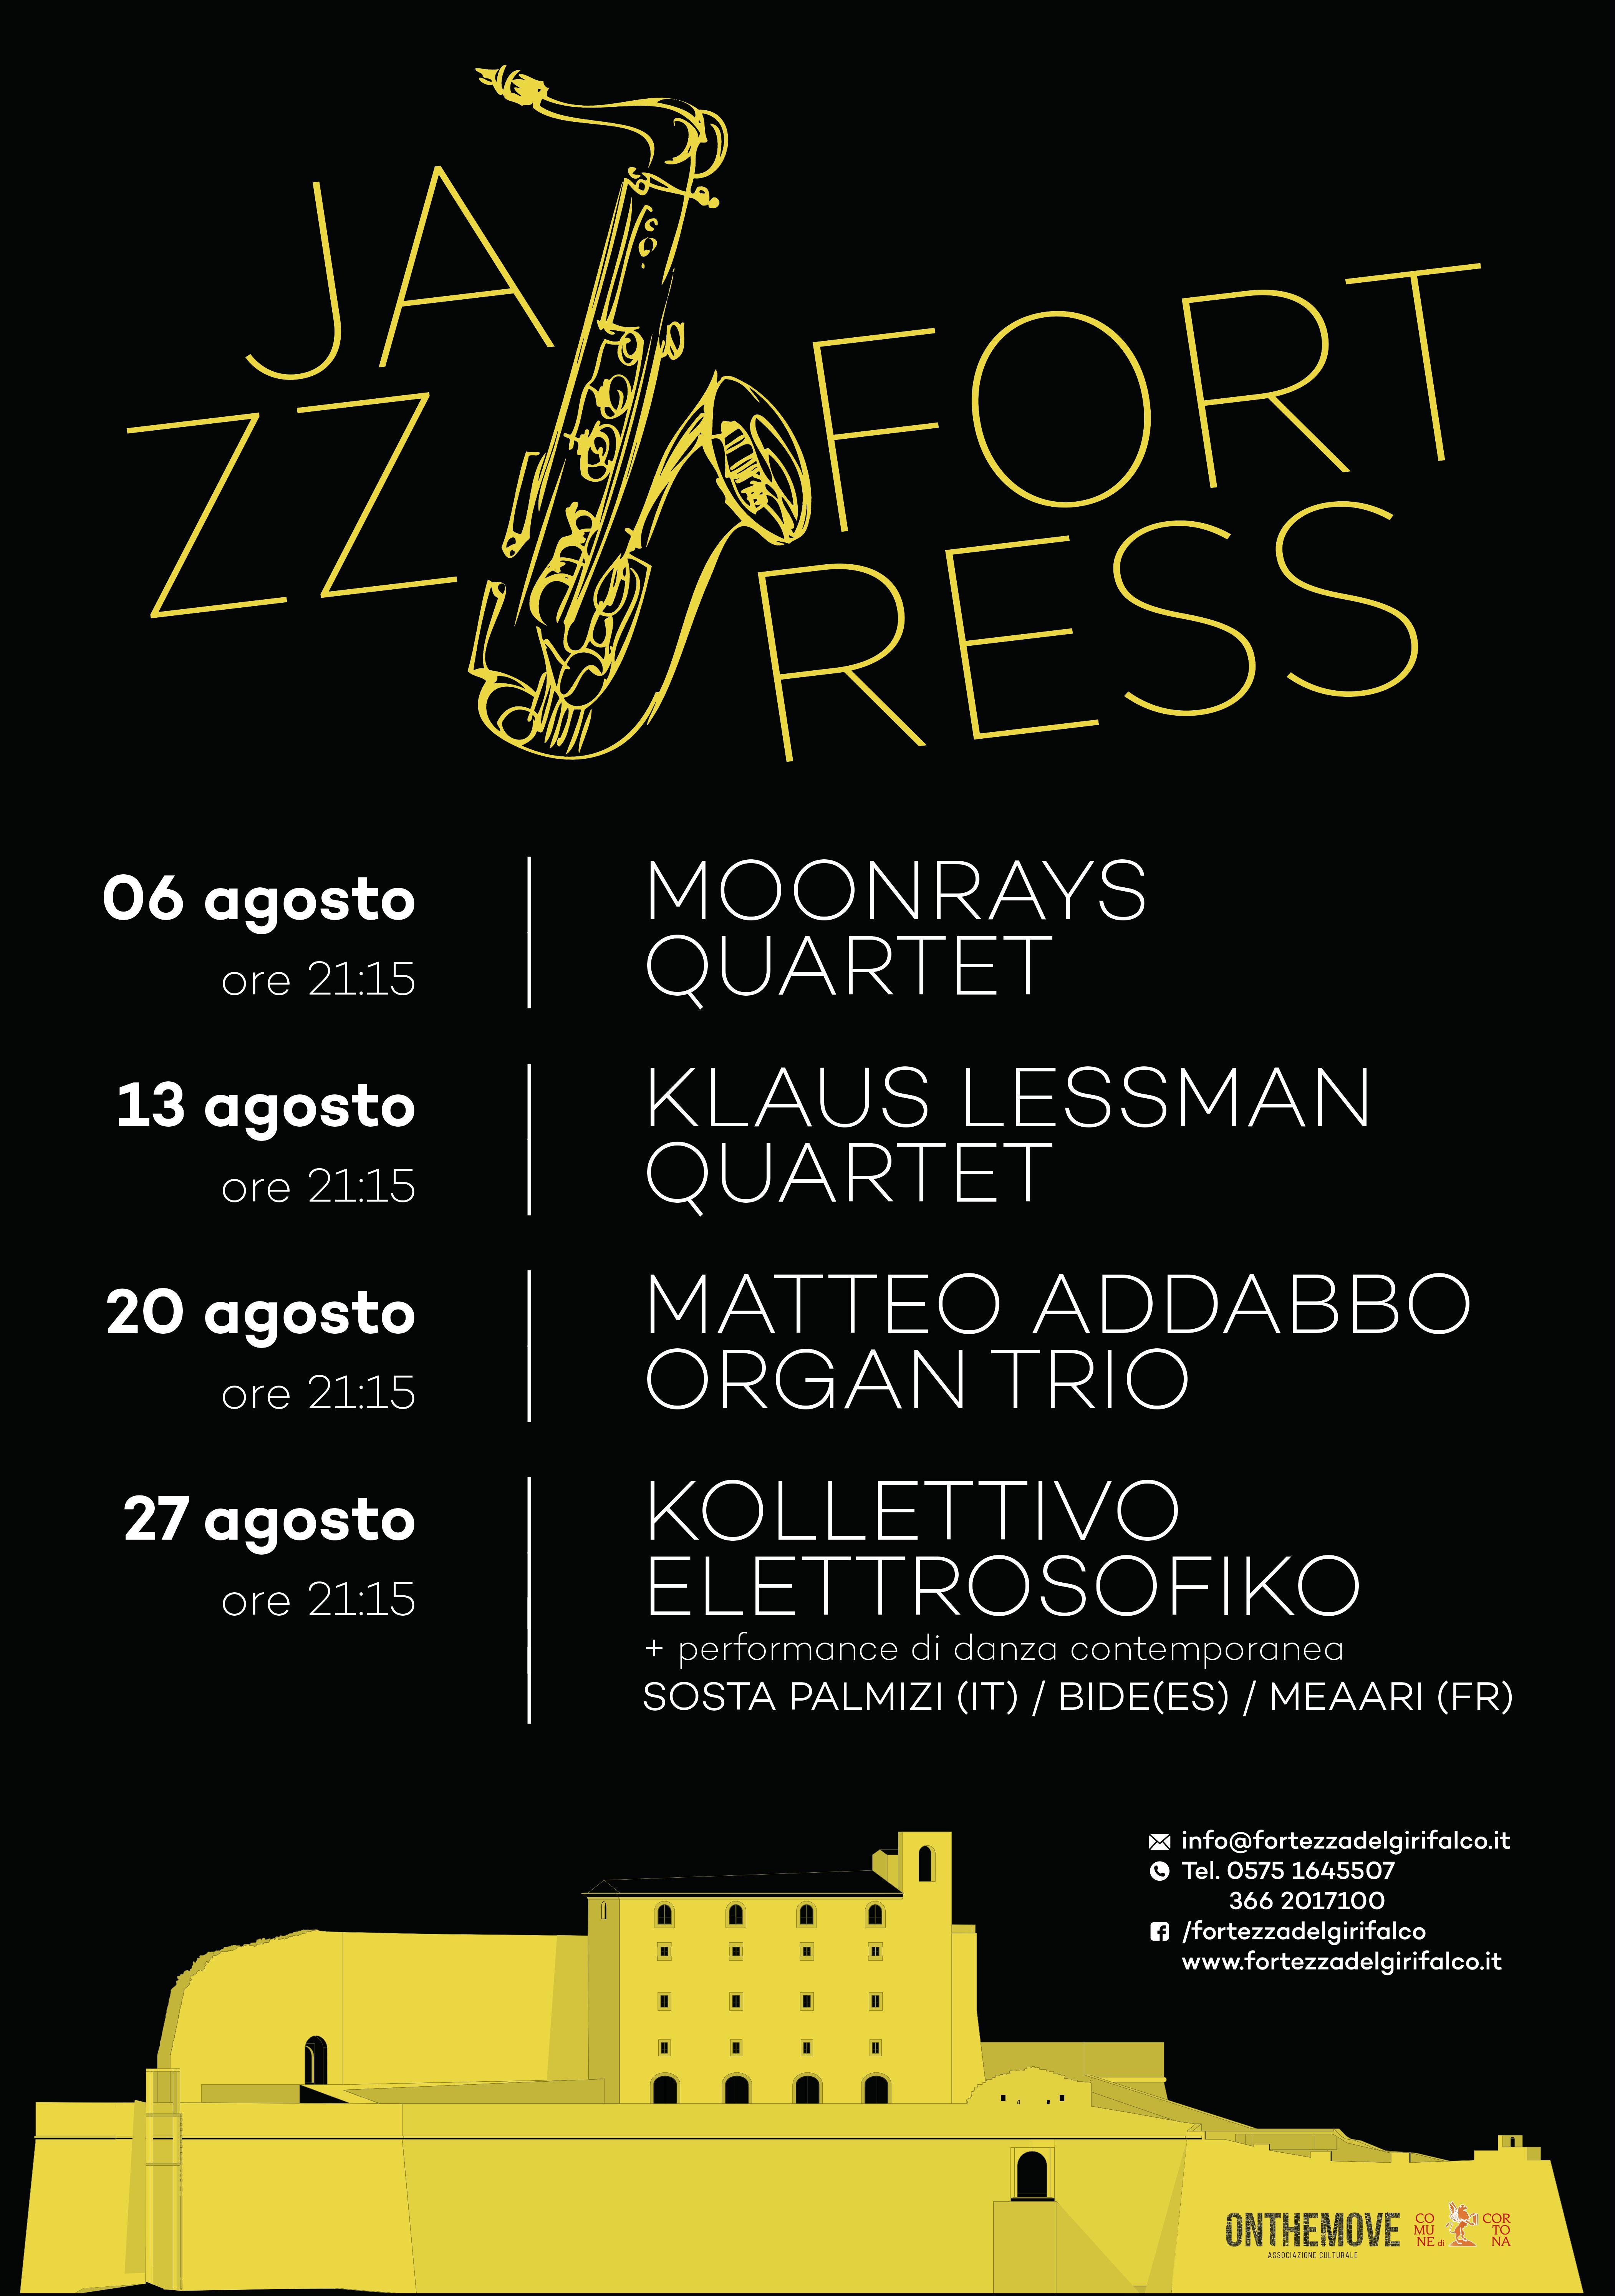 Jazz @ Fortress: al Girifalco 4 domeniche a tutto Jazz